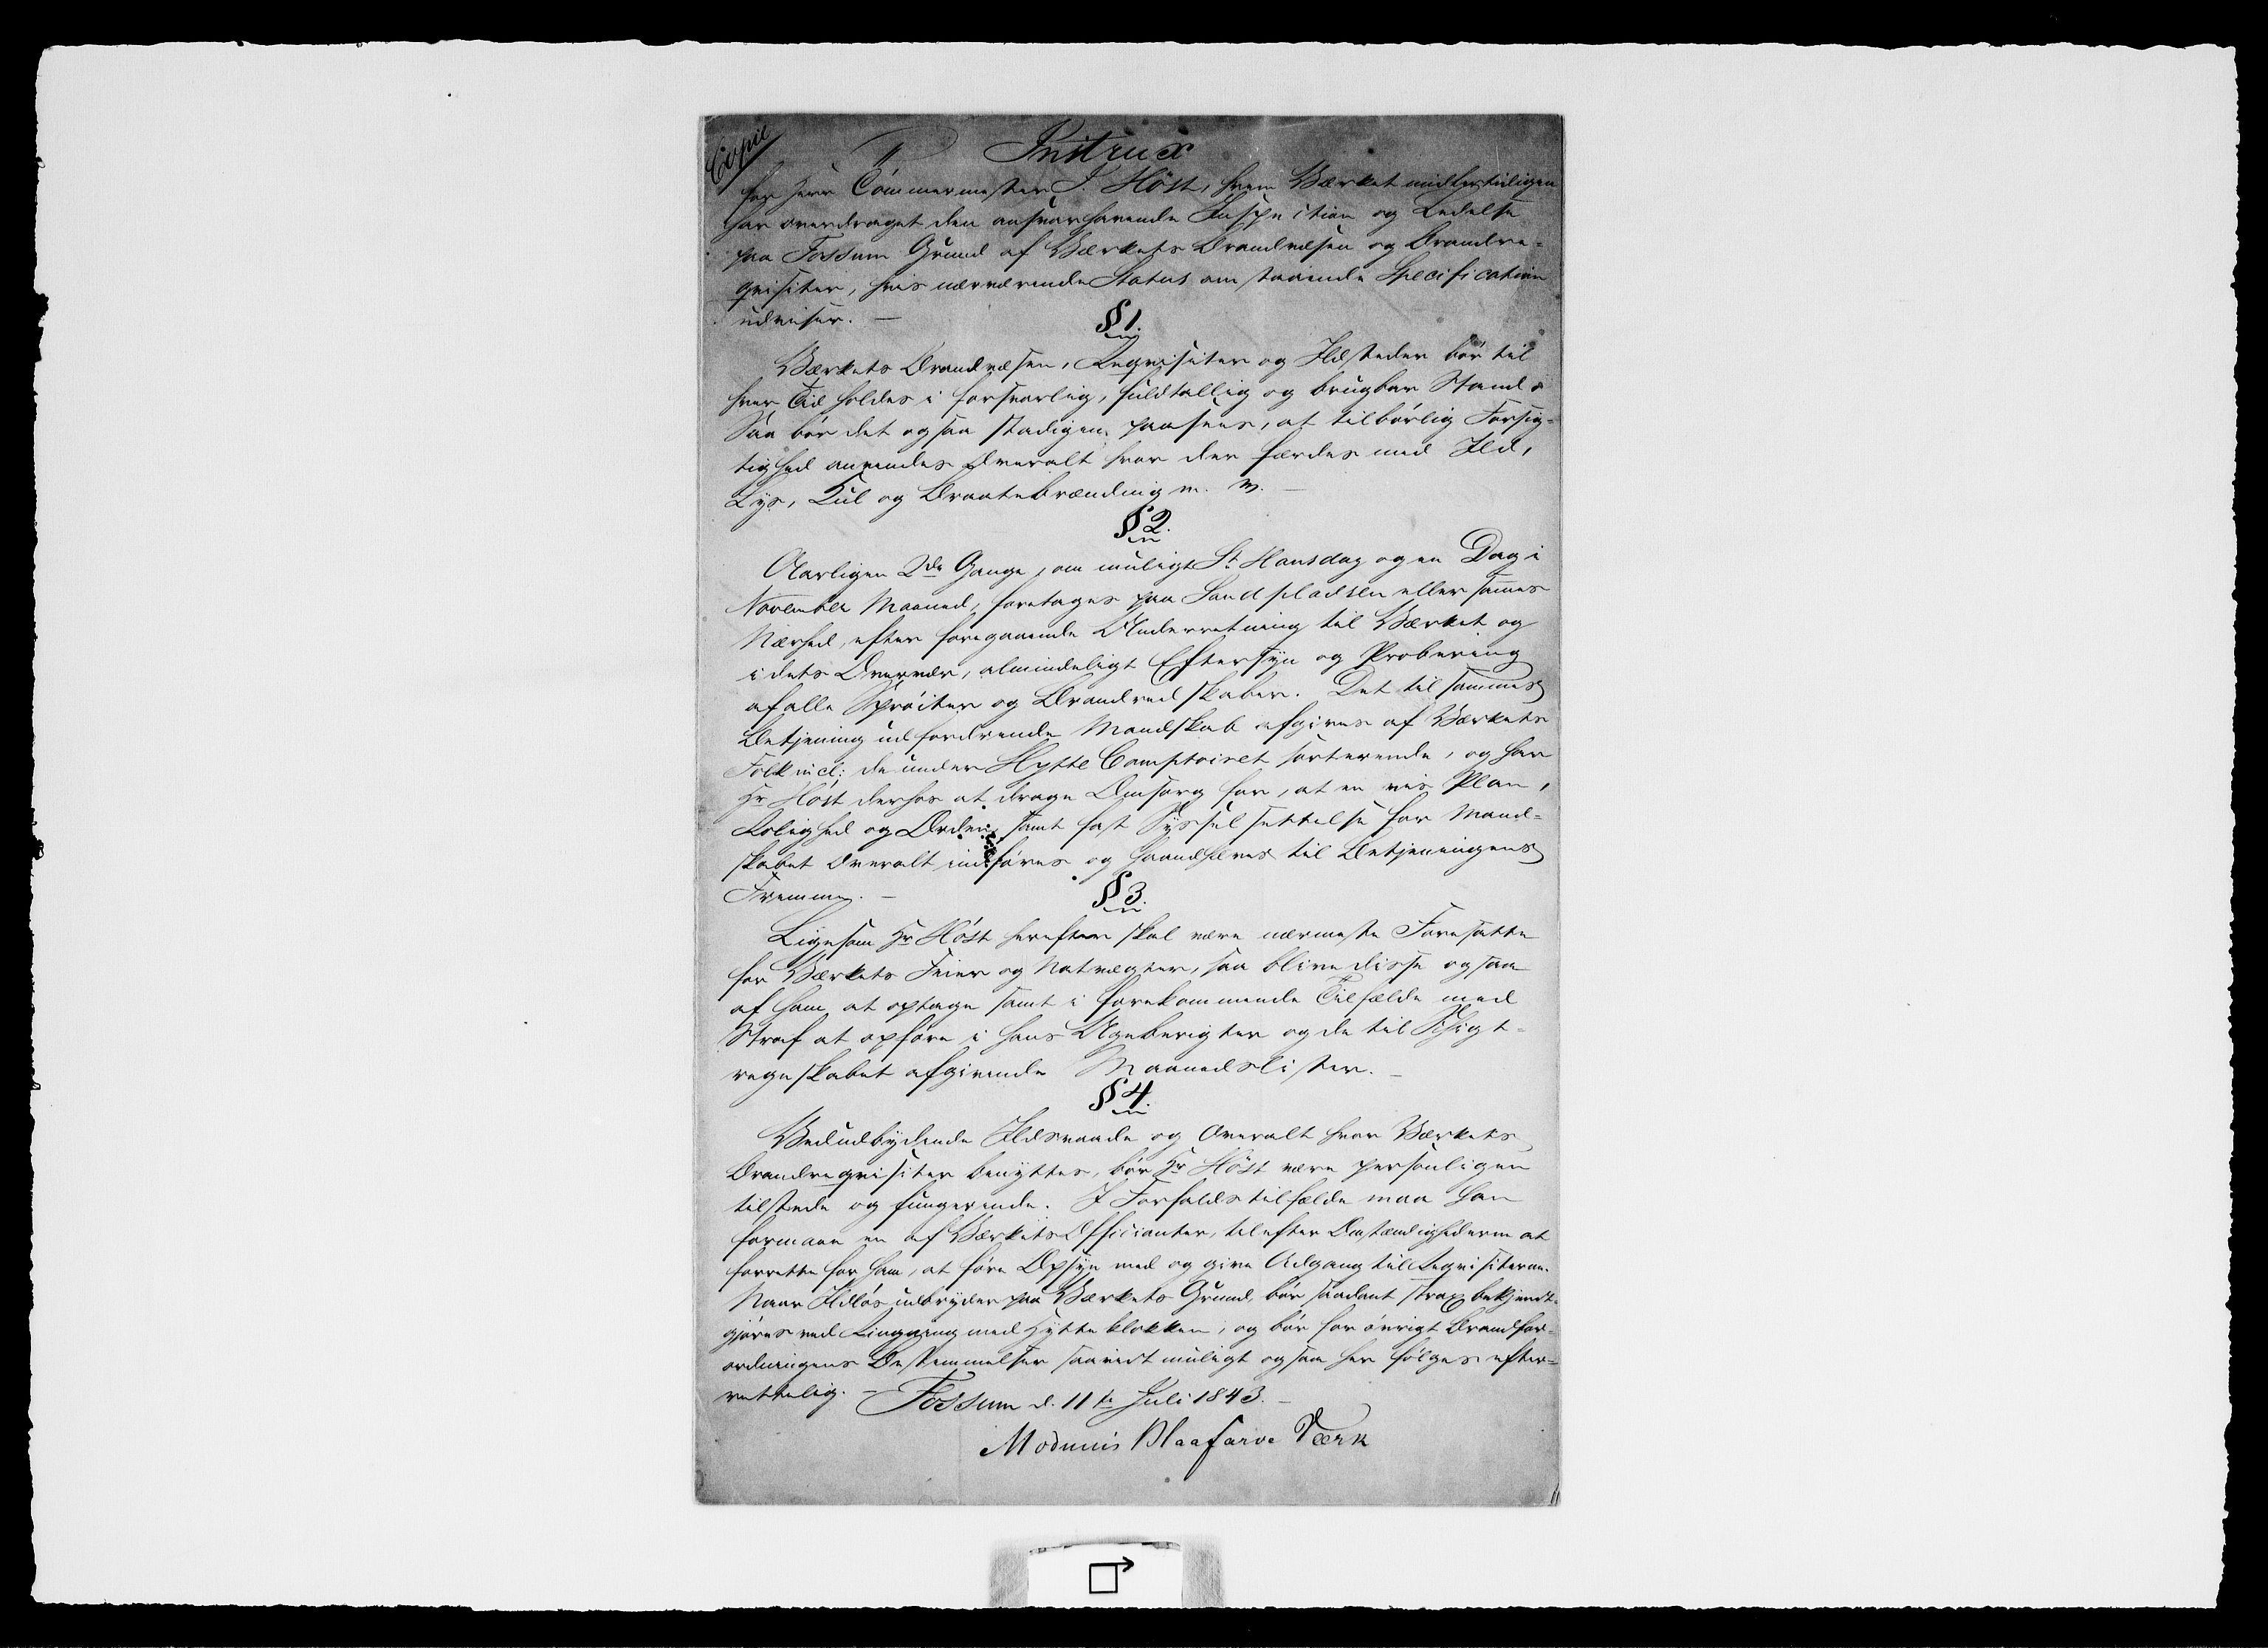 RA, Modums Blaafarveværk, G/Ga/L0064, 1828-1848, s. 2